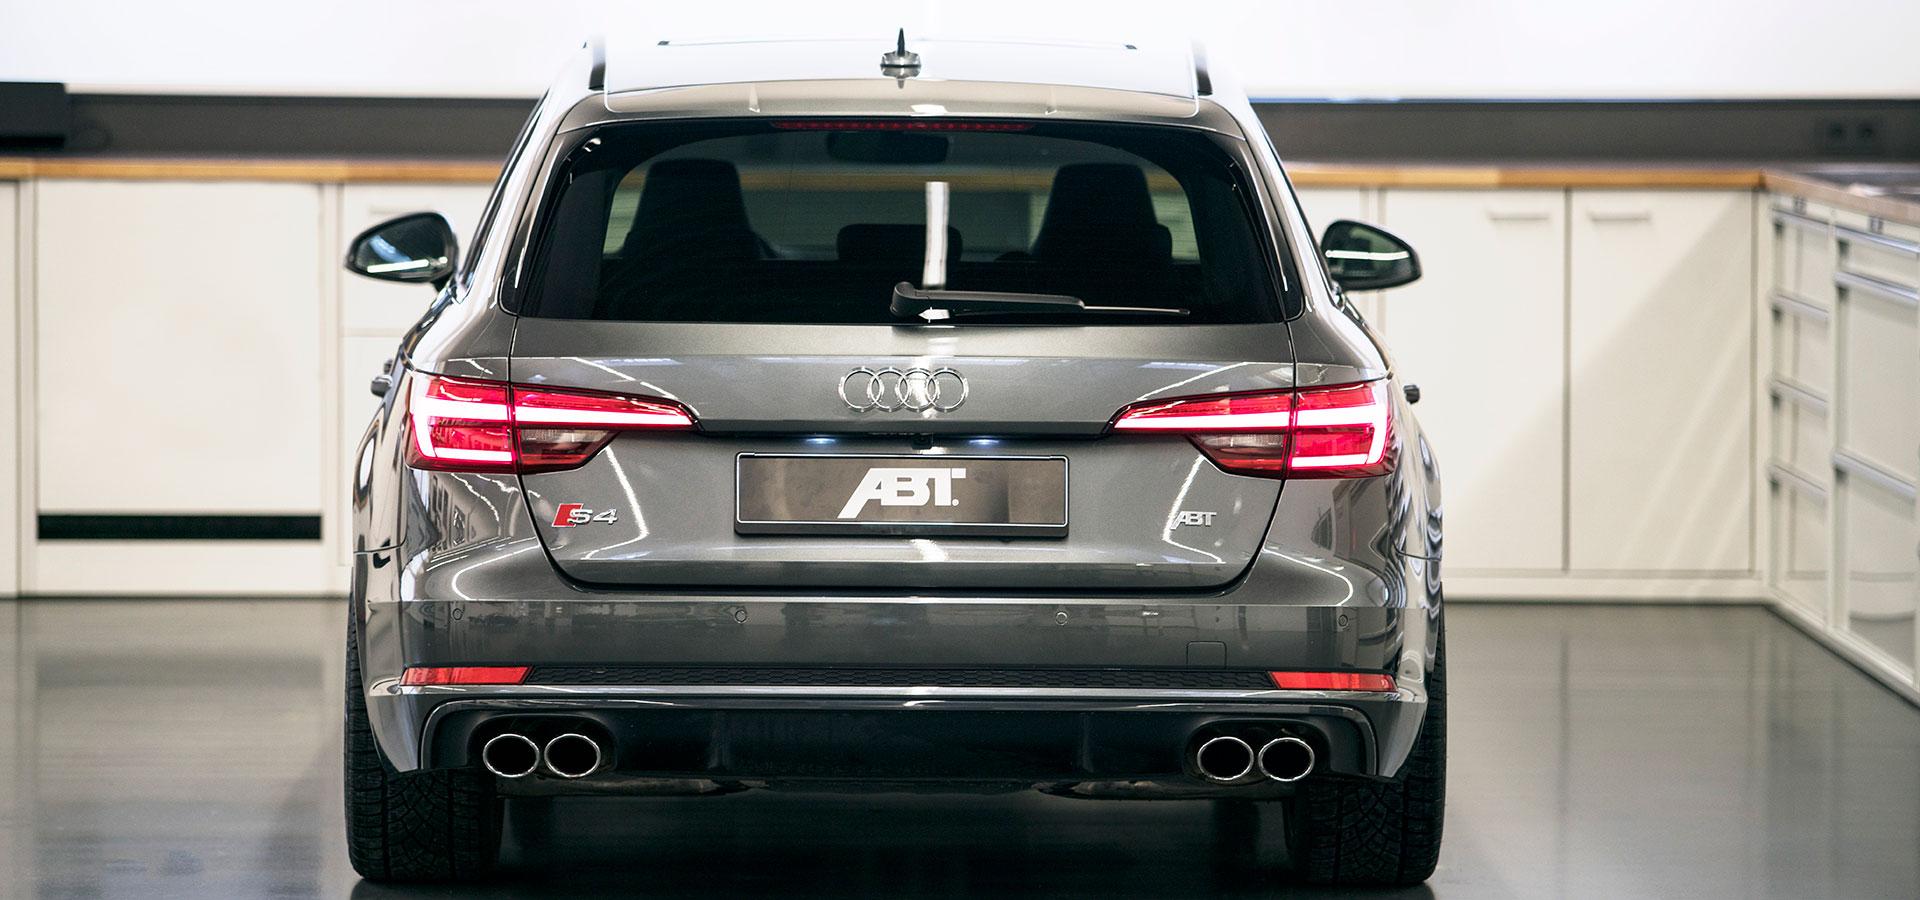 430Hp Audi S4 B9 - Disun